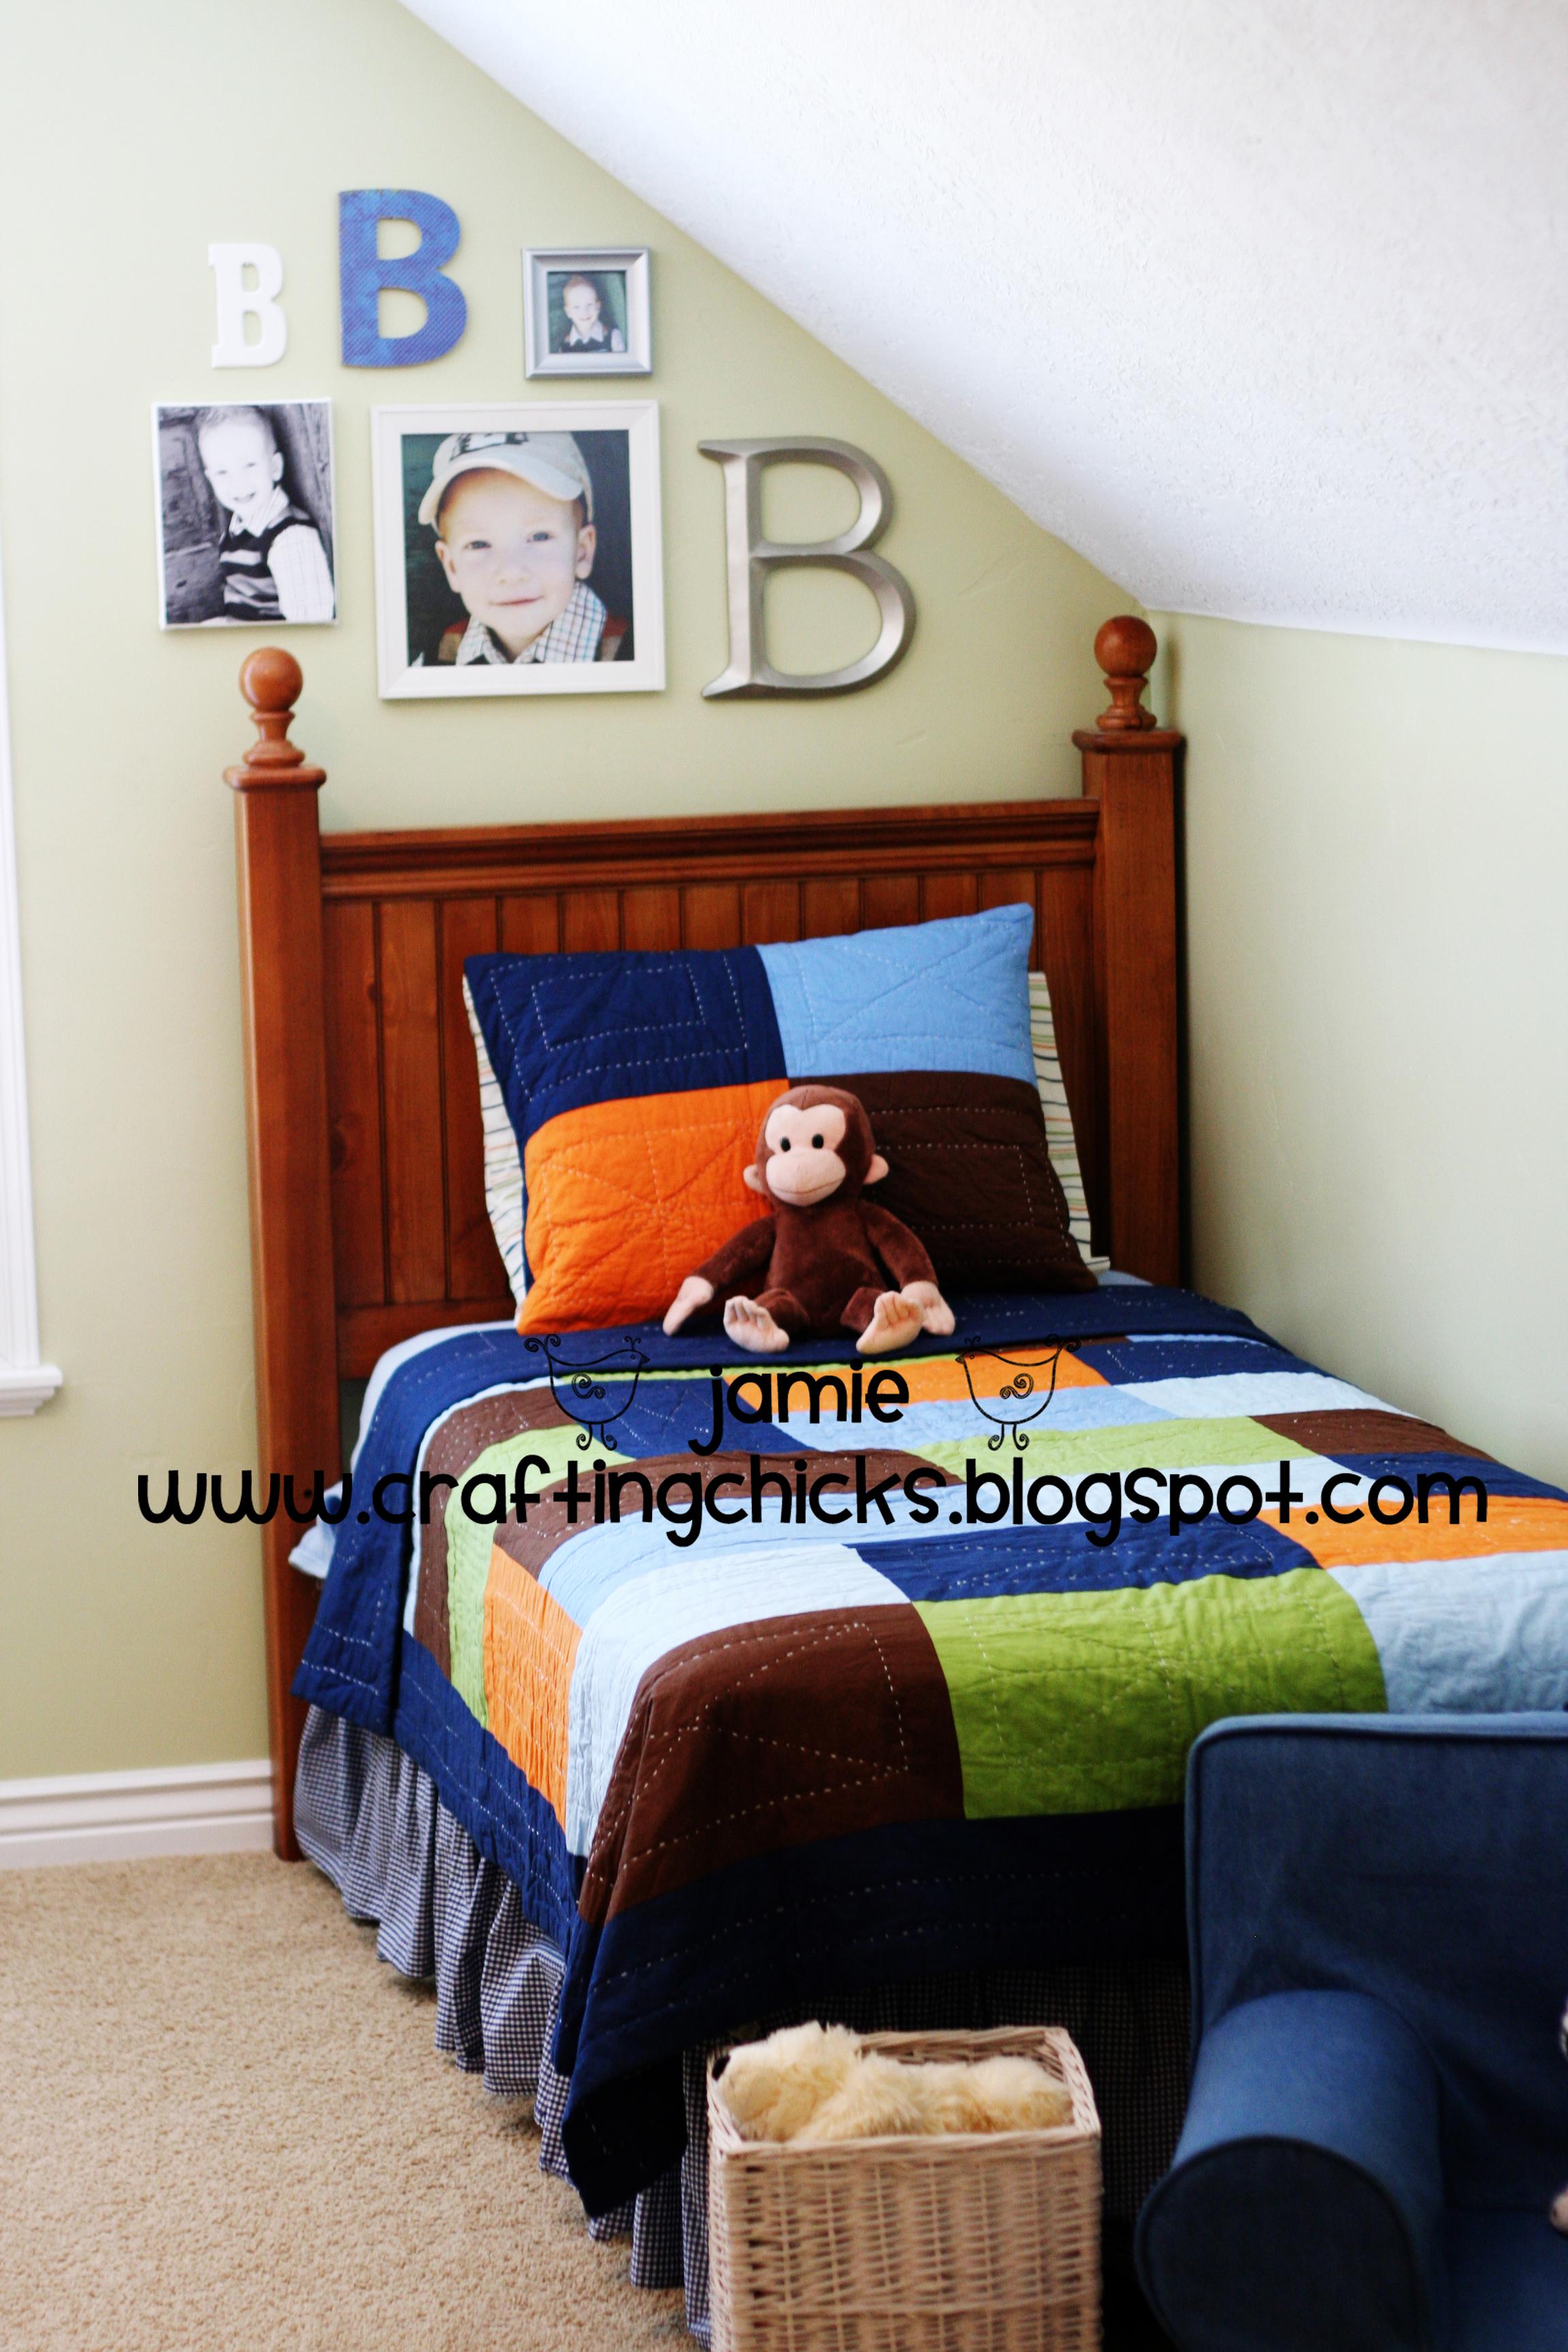 Diy kid room decor monogram photo wall the crafting chicks for Diy boys bedroom ideas